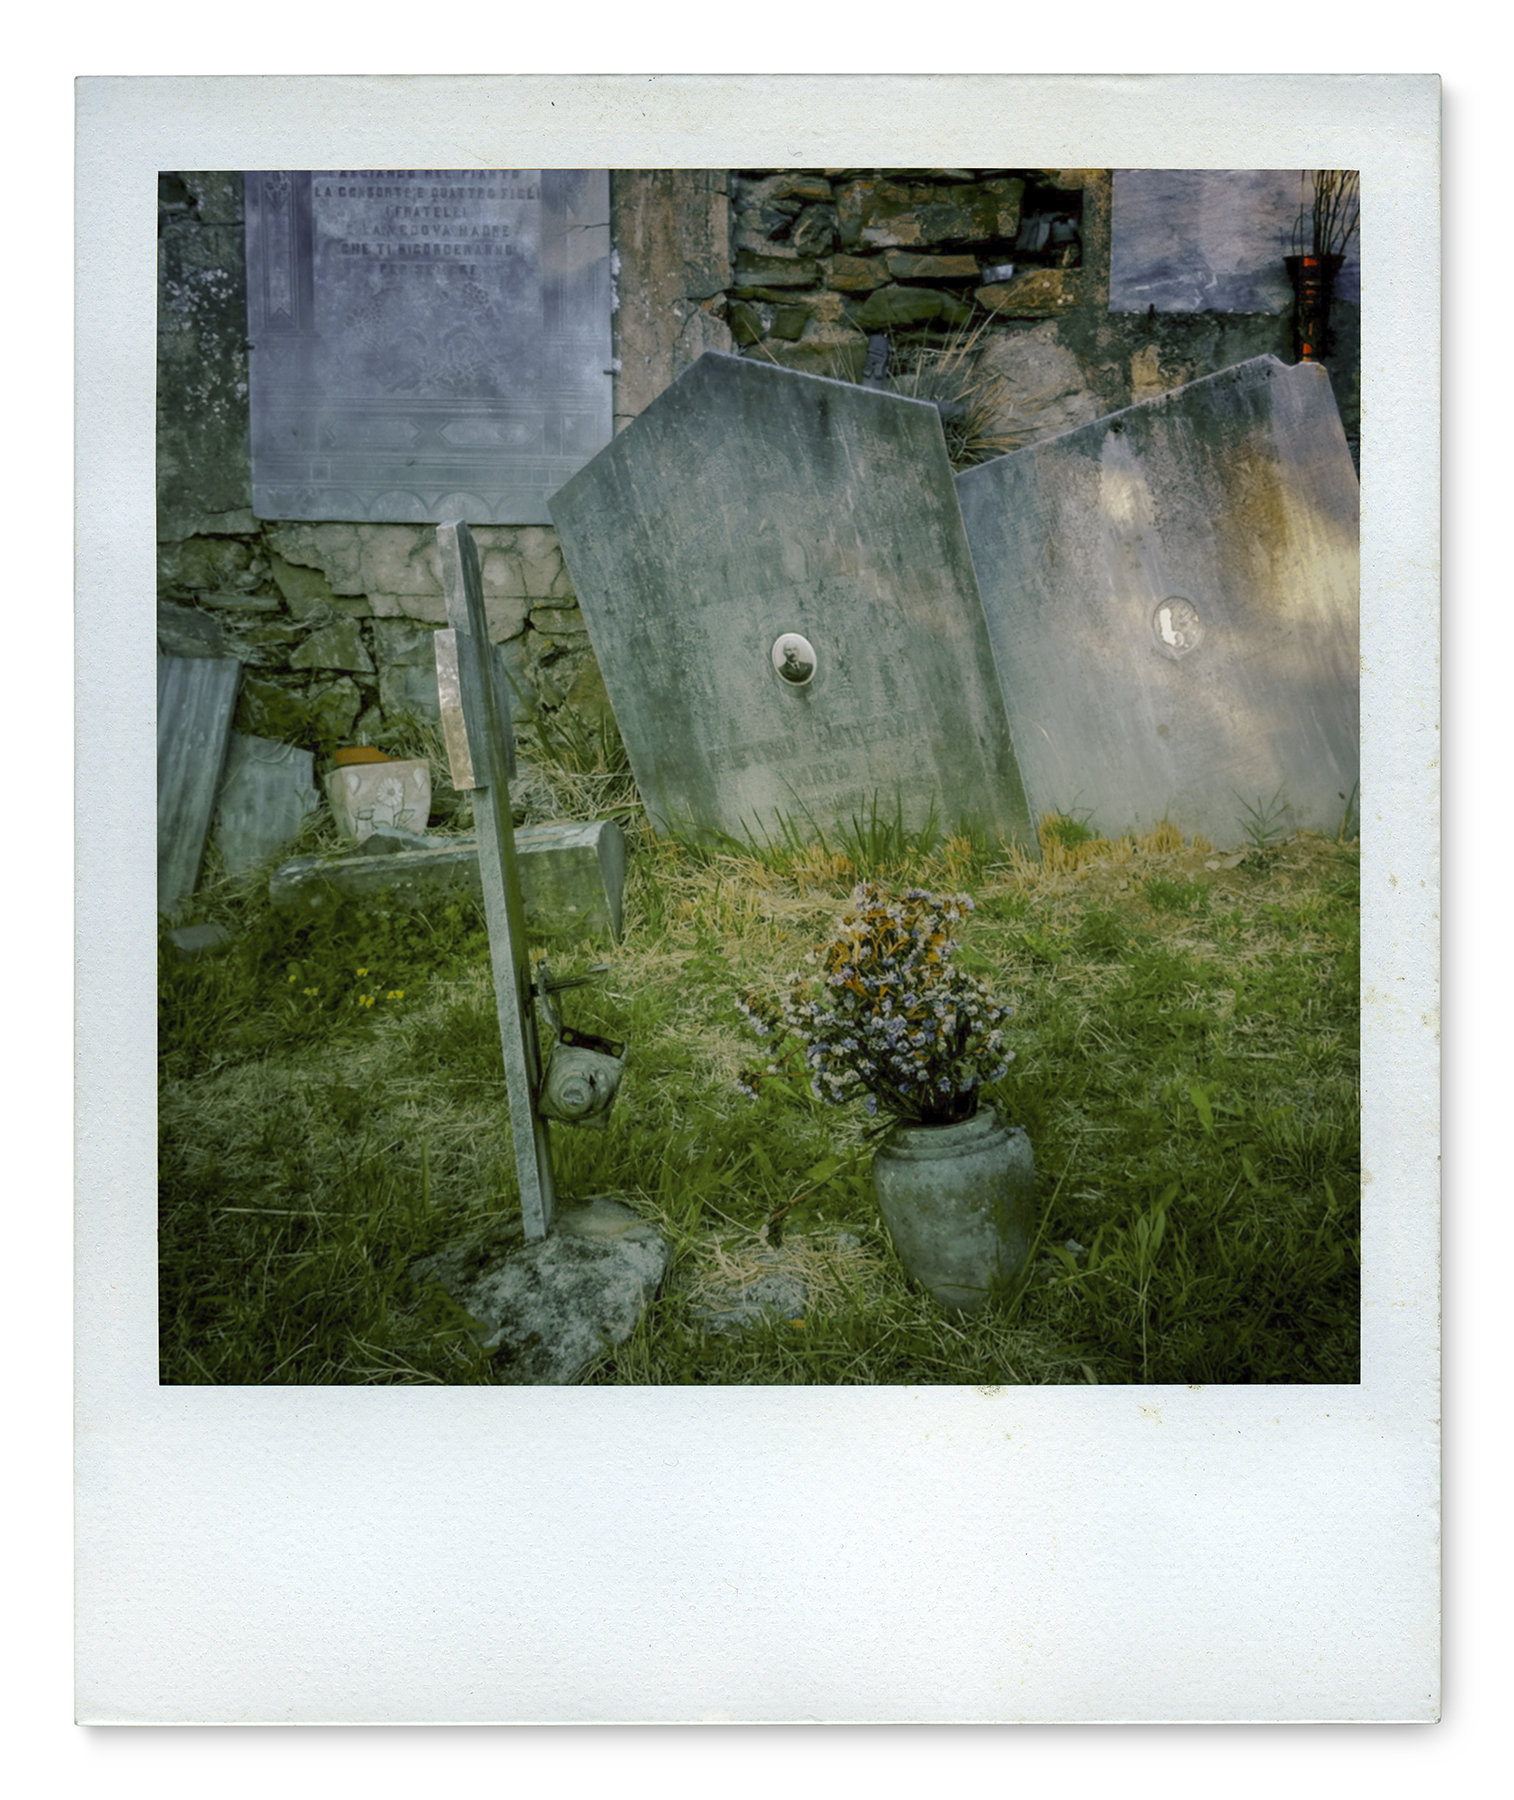 005_Polaroid SX70_IMG_2413.jpg